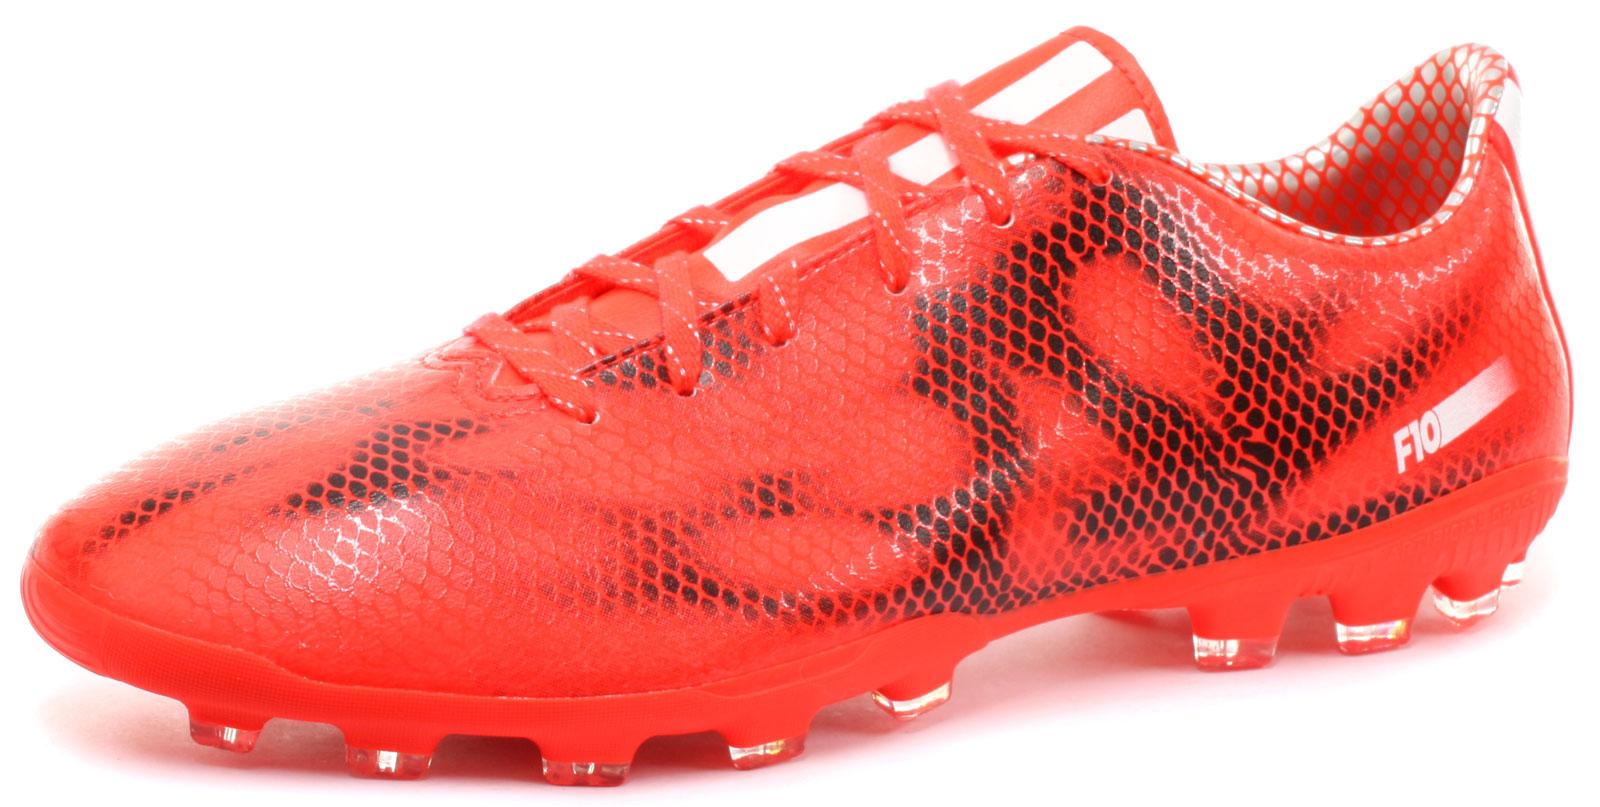 New-adidas-F10-AG-Artificial-Grass-Mens-Football-Boots-Size-UK-9